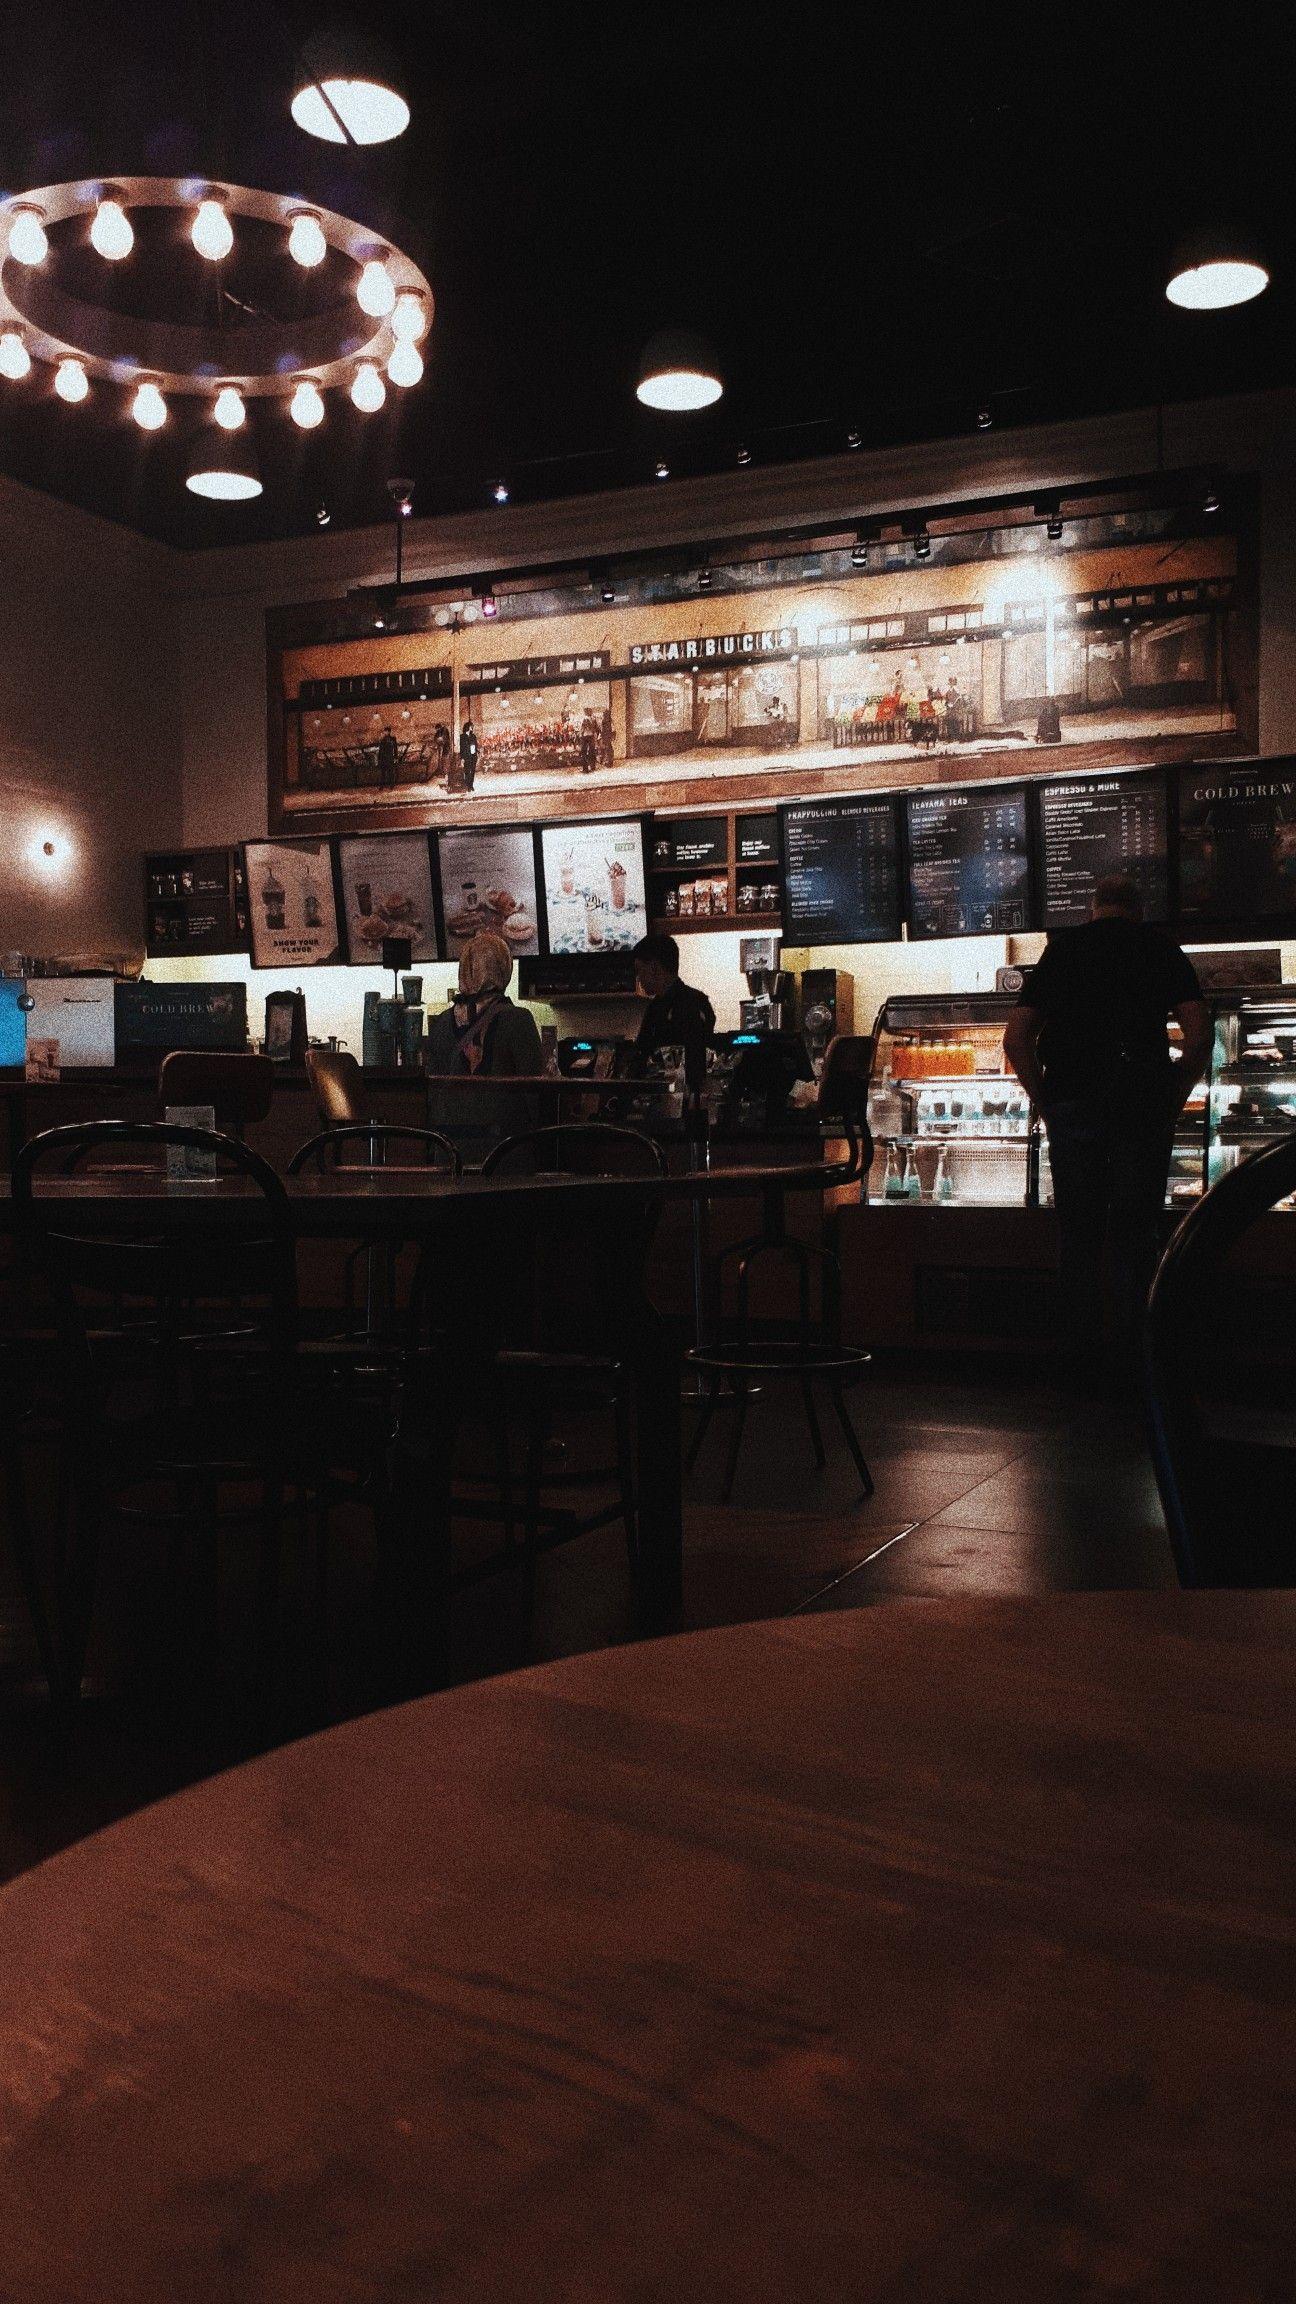 Starbucks Jogja City Mall Yogyakarta Rumah Teras Kafe Desain